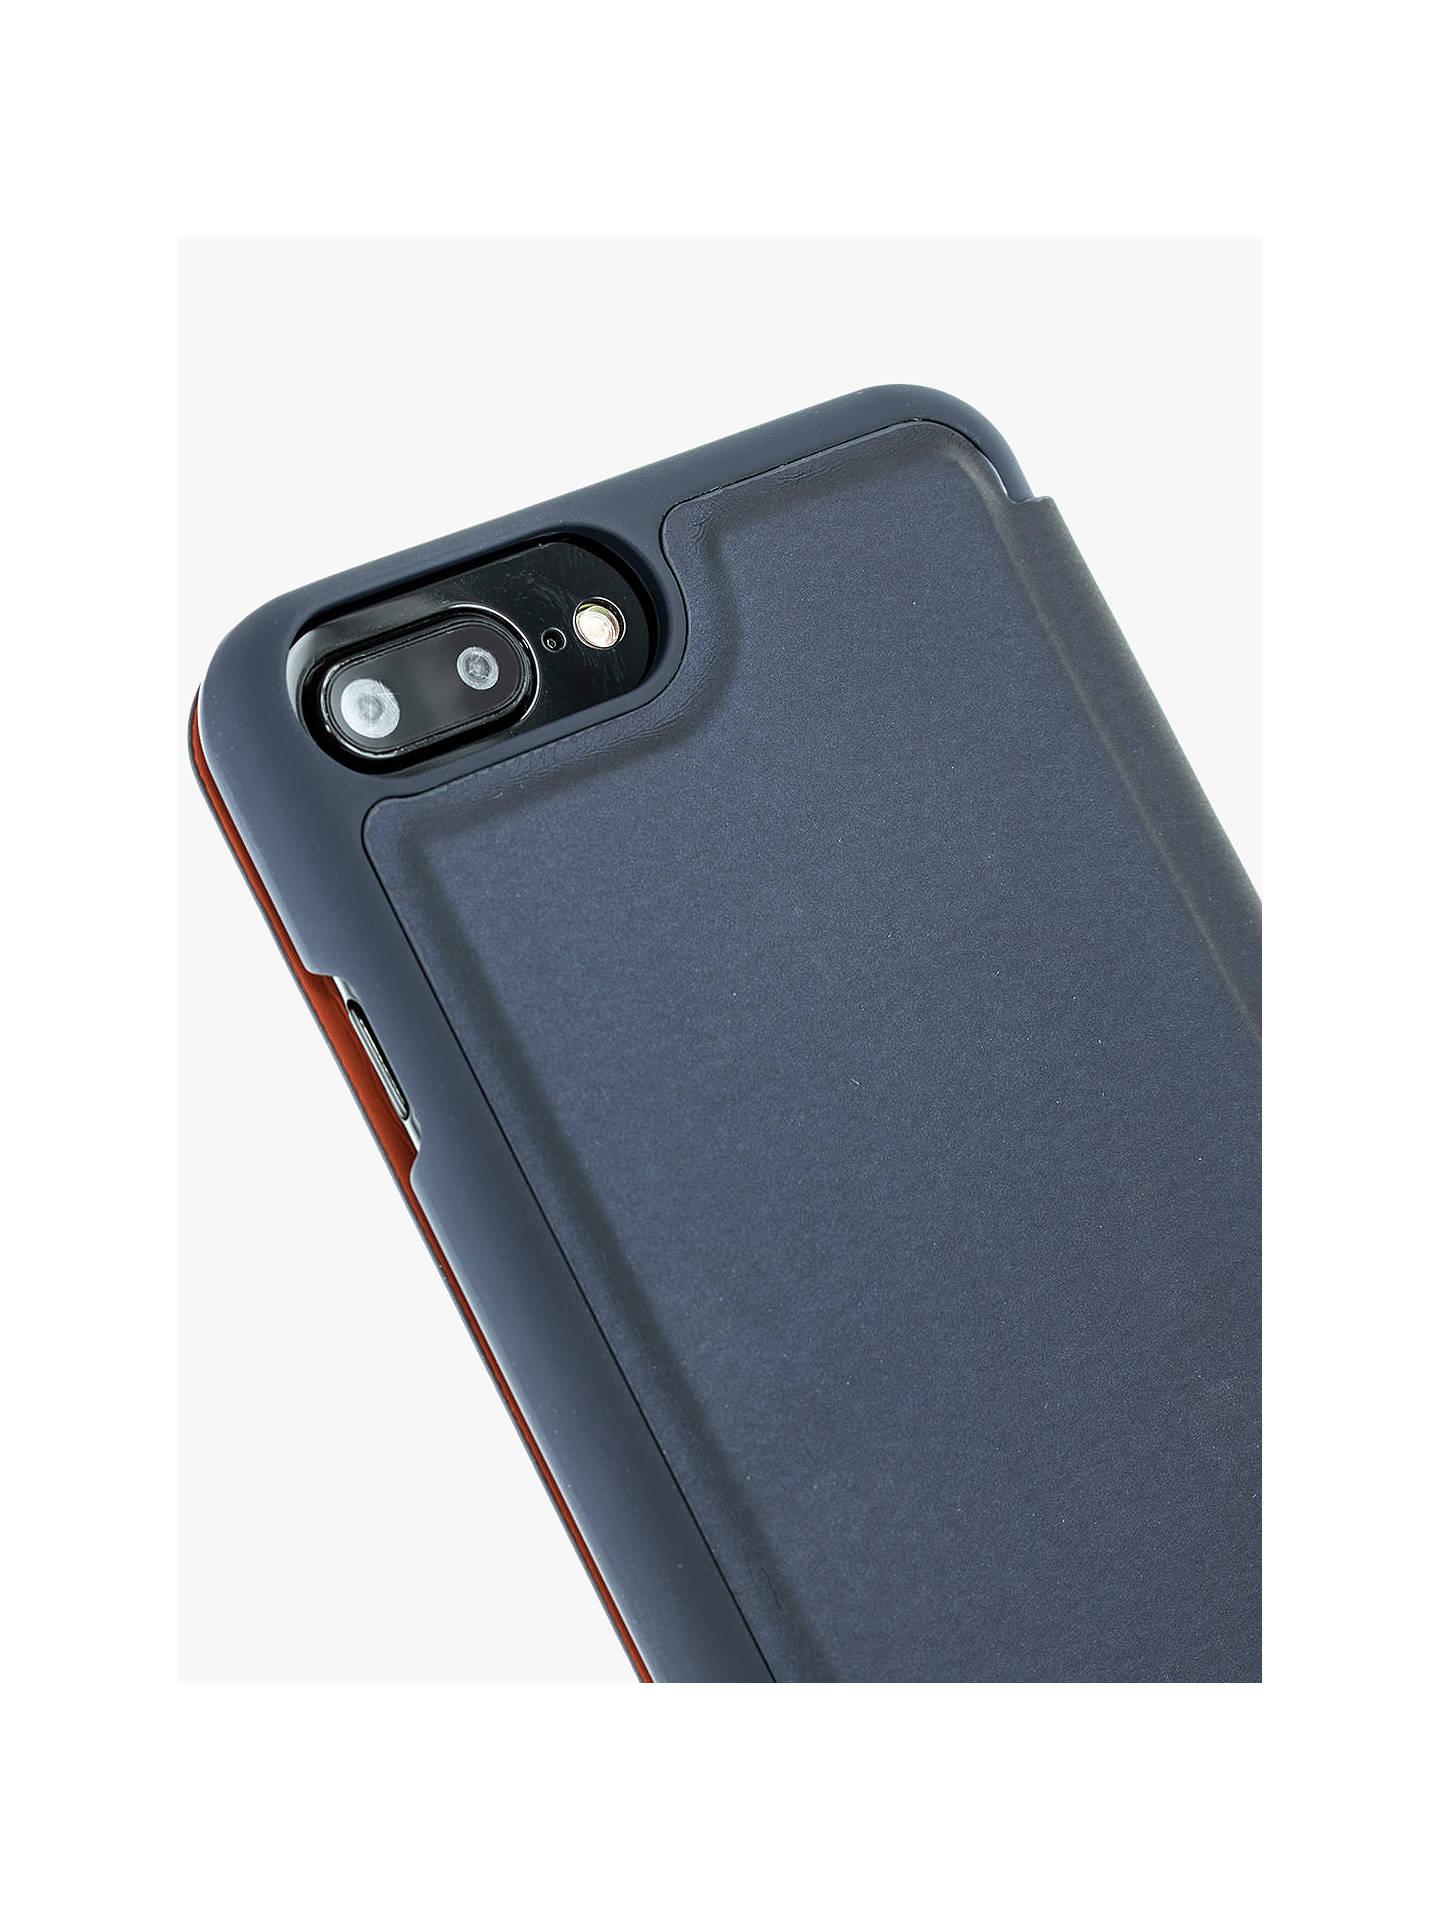 52b1b5cb1 ... Buy Ted Baker Tettra Folio Case for iPhone 6 Plus   7 Plus and 8 Plus